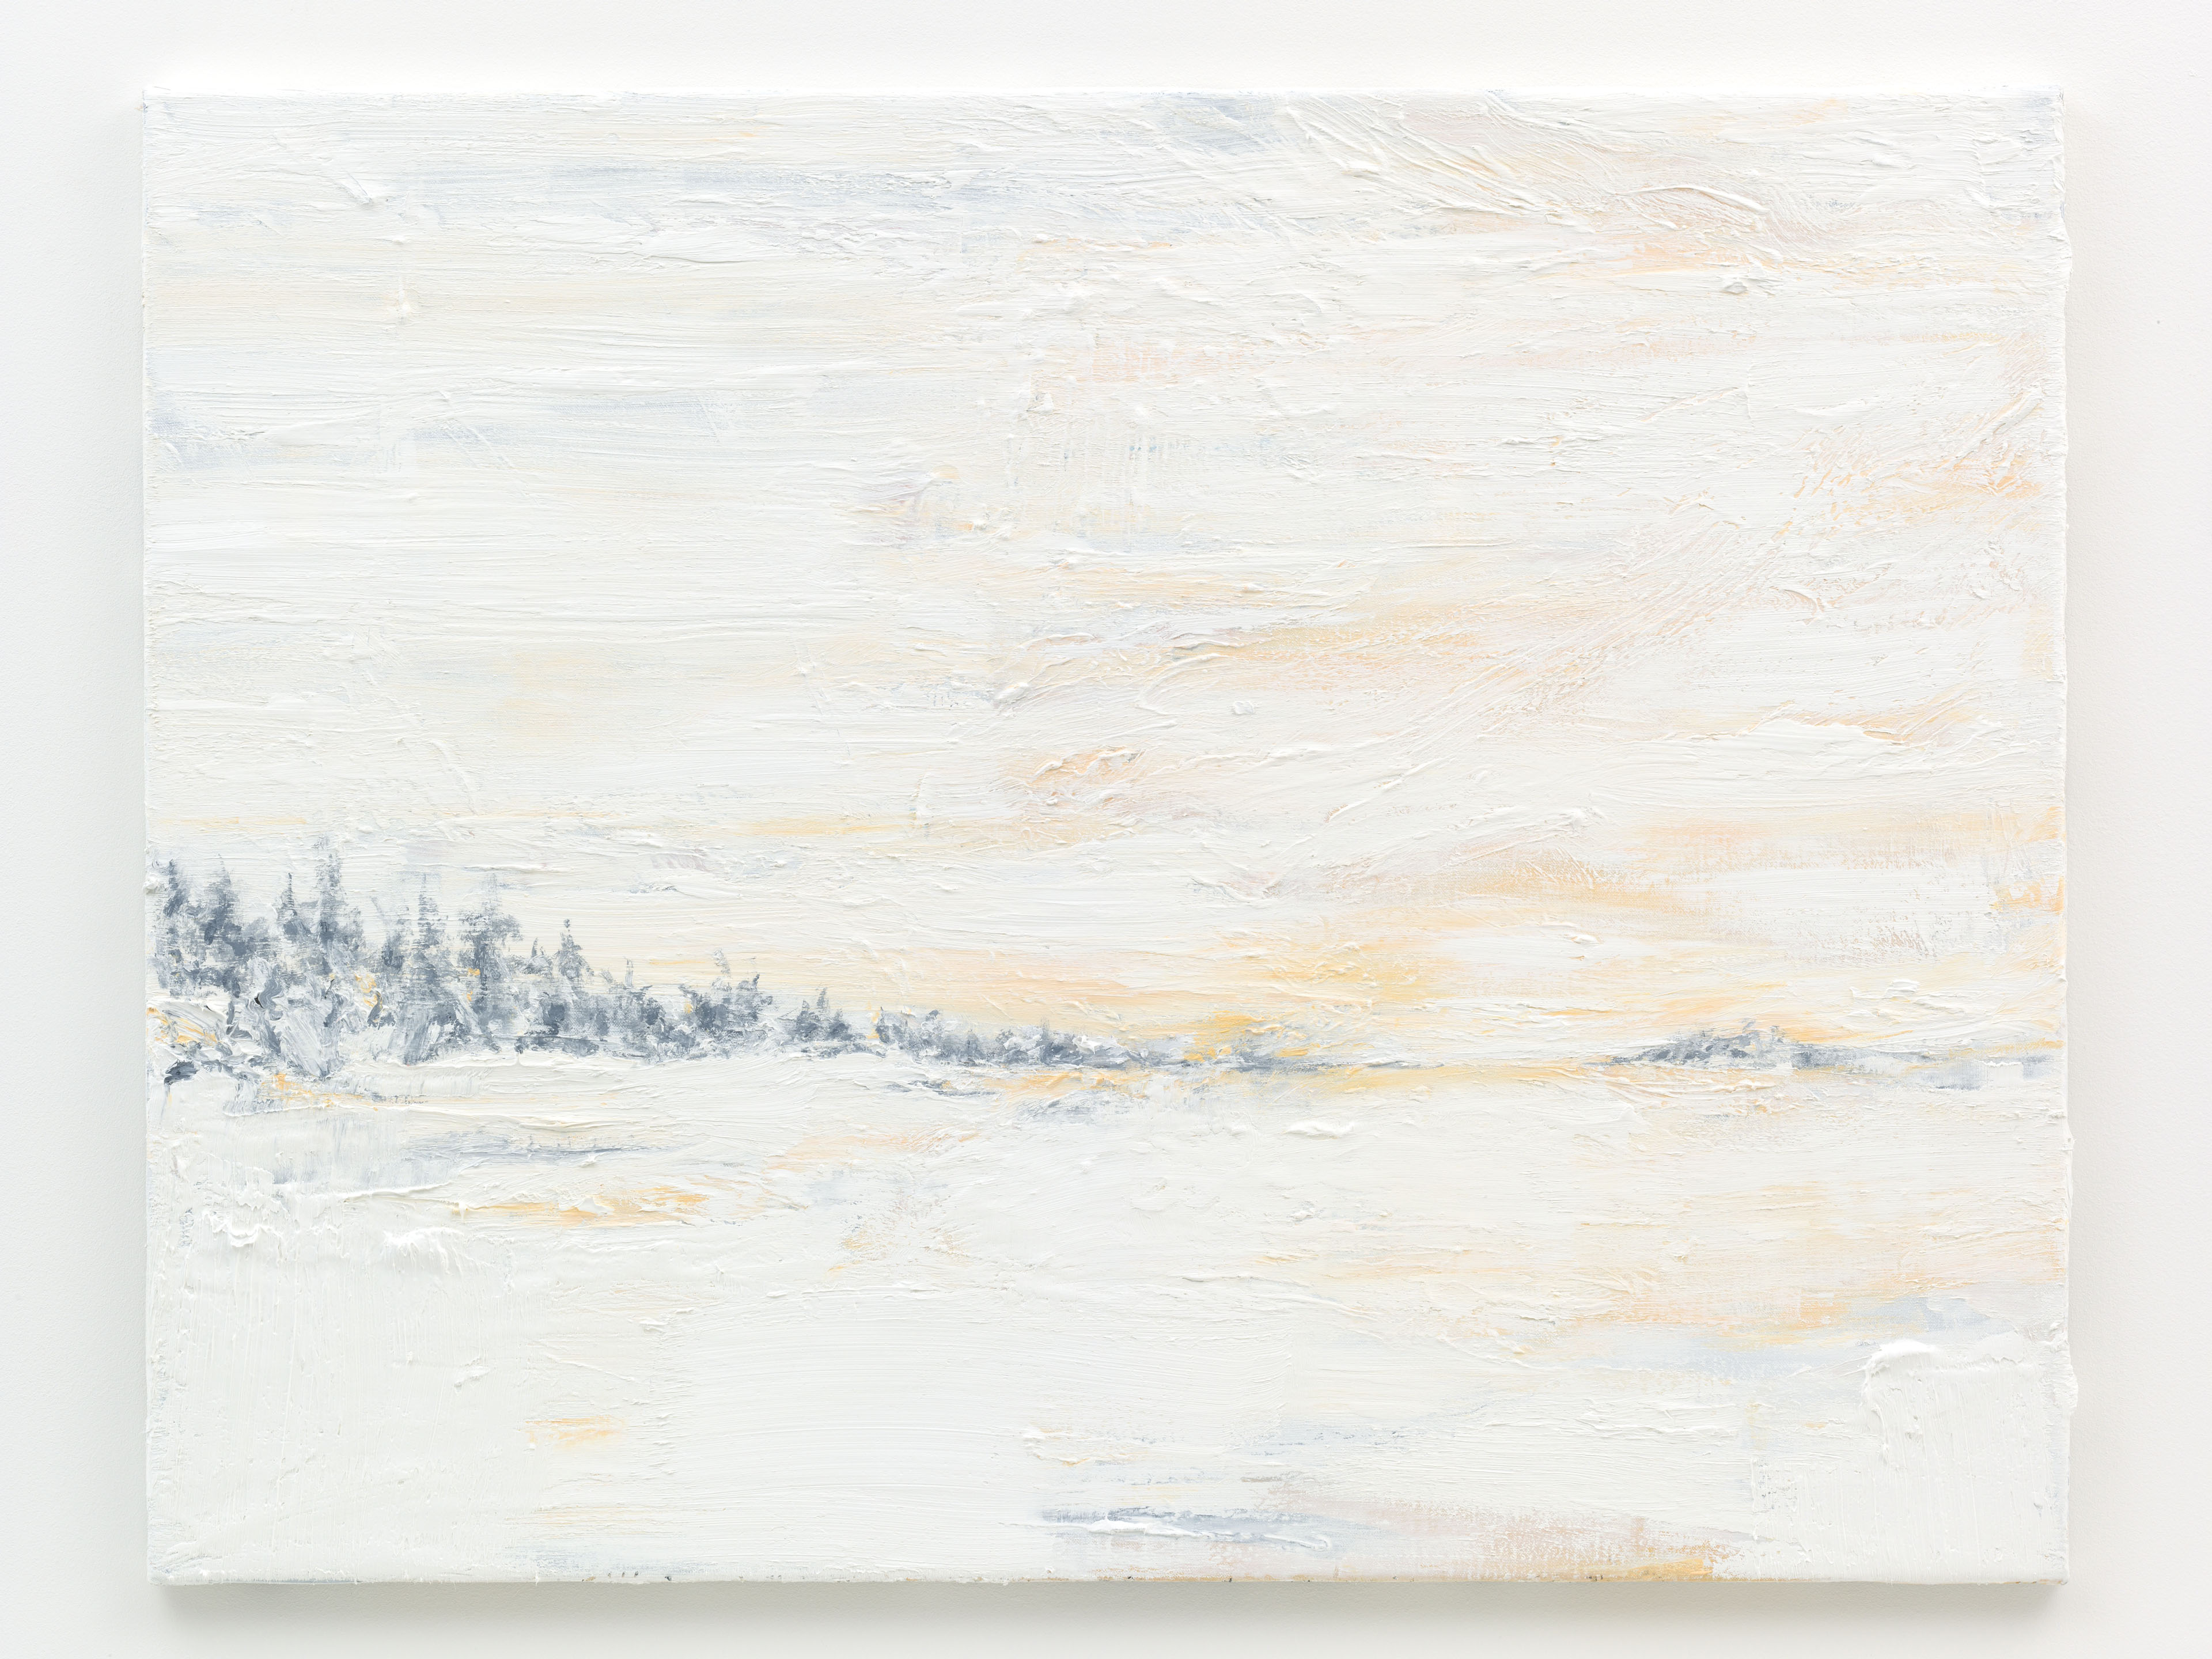 """Neve III"" 70 x 90 cm. oil on linen 2015"